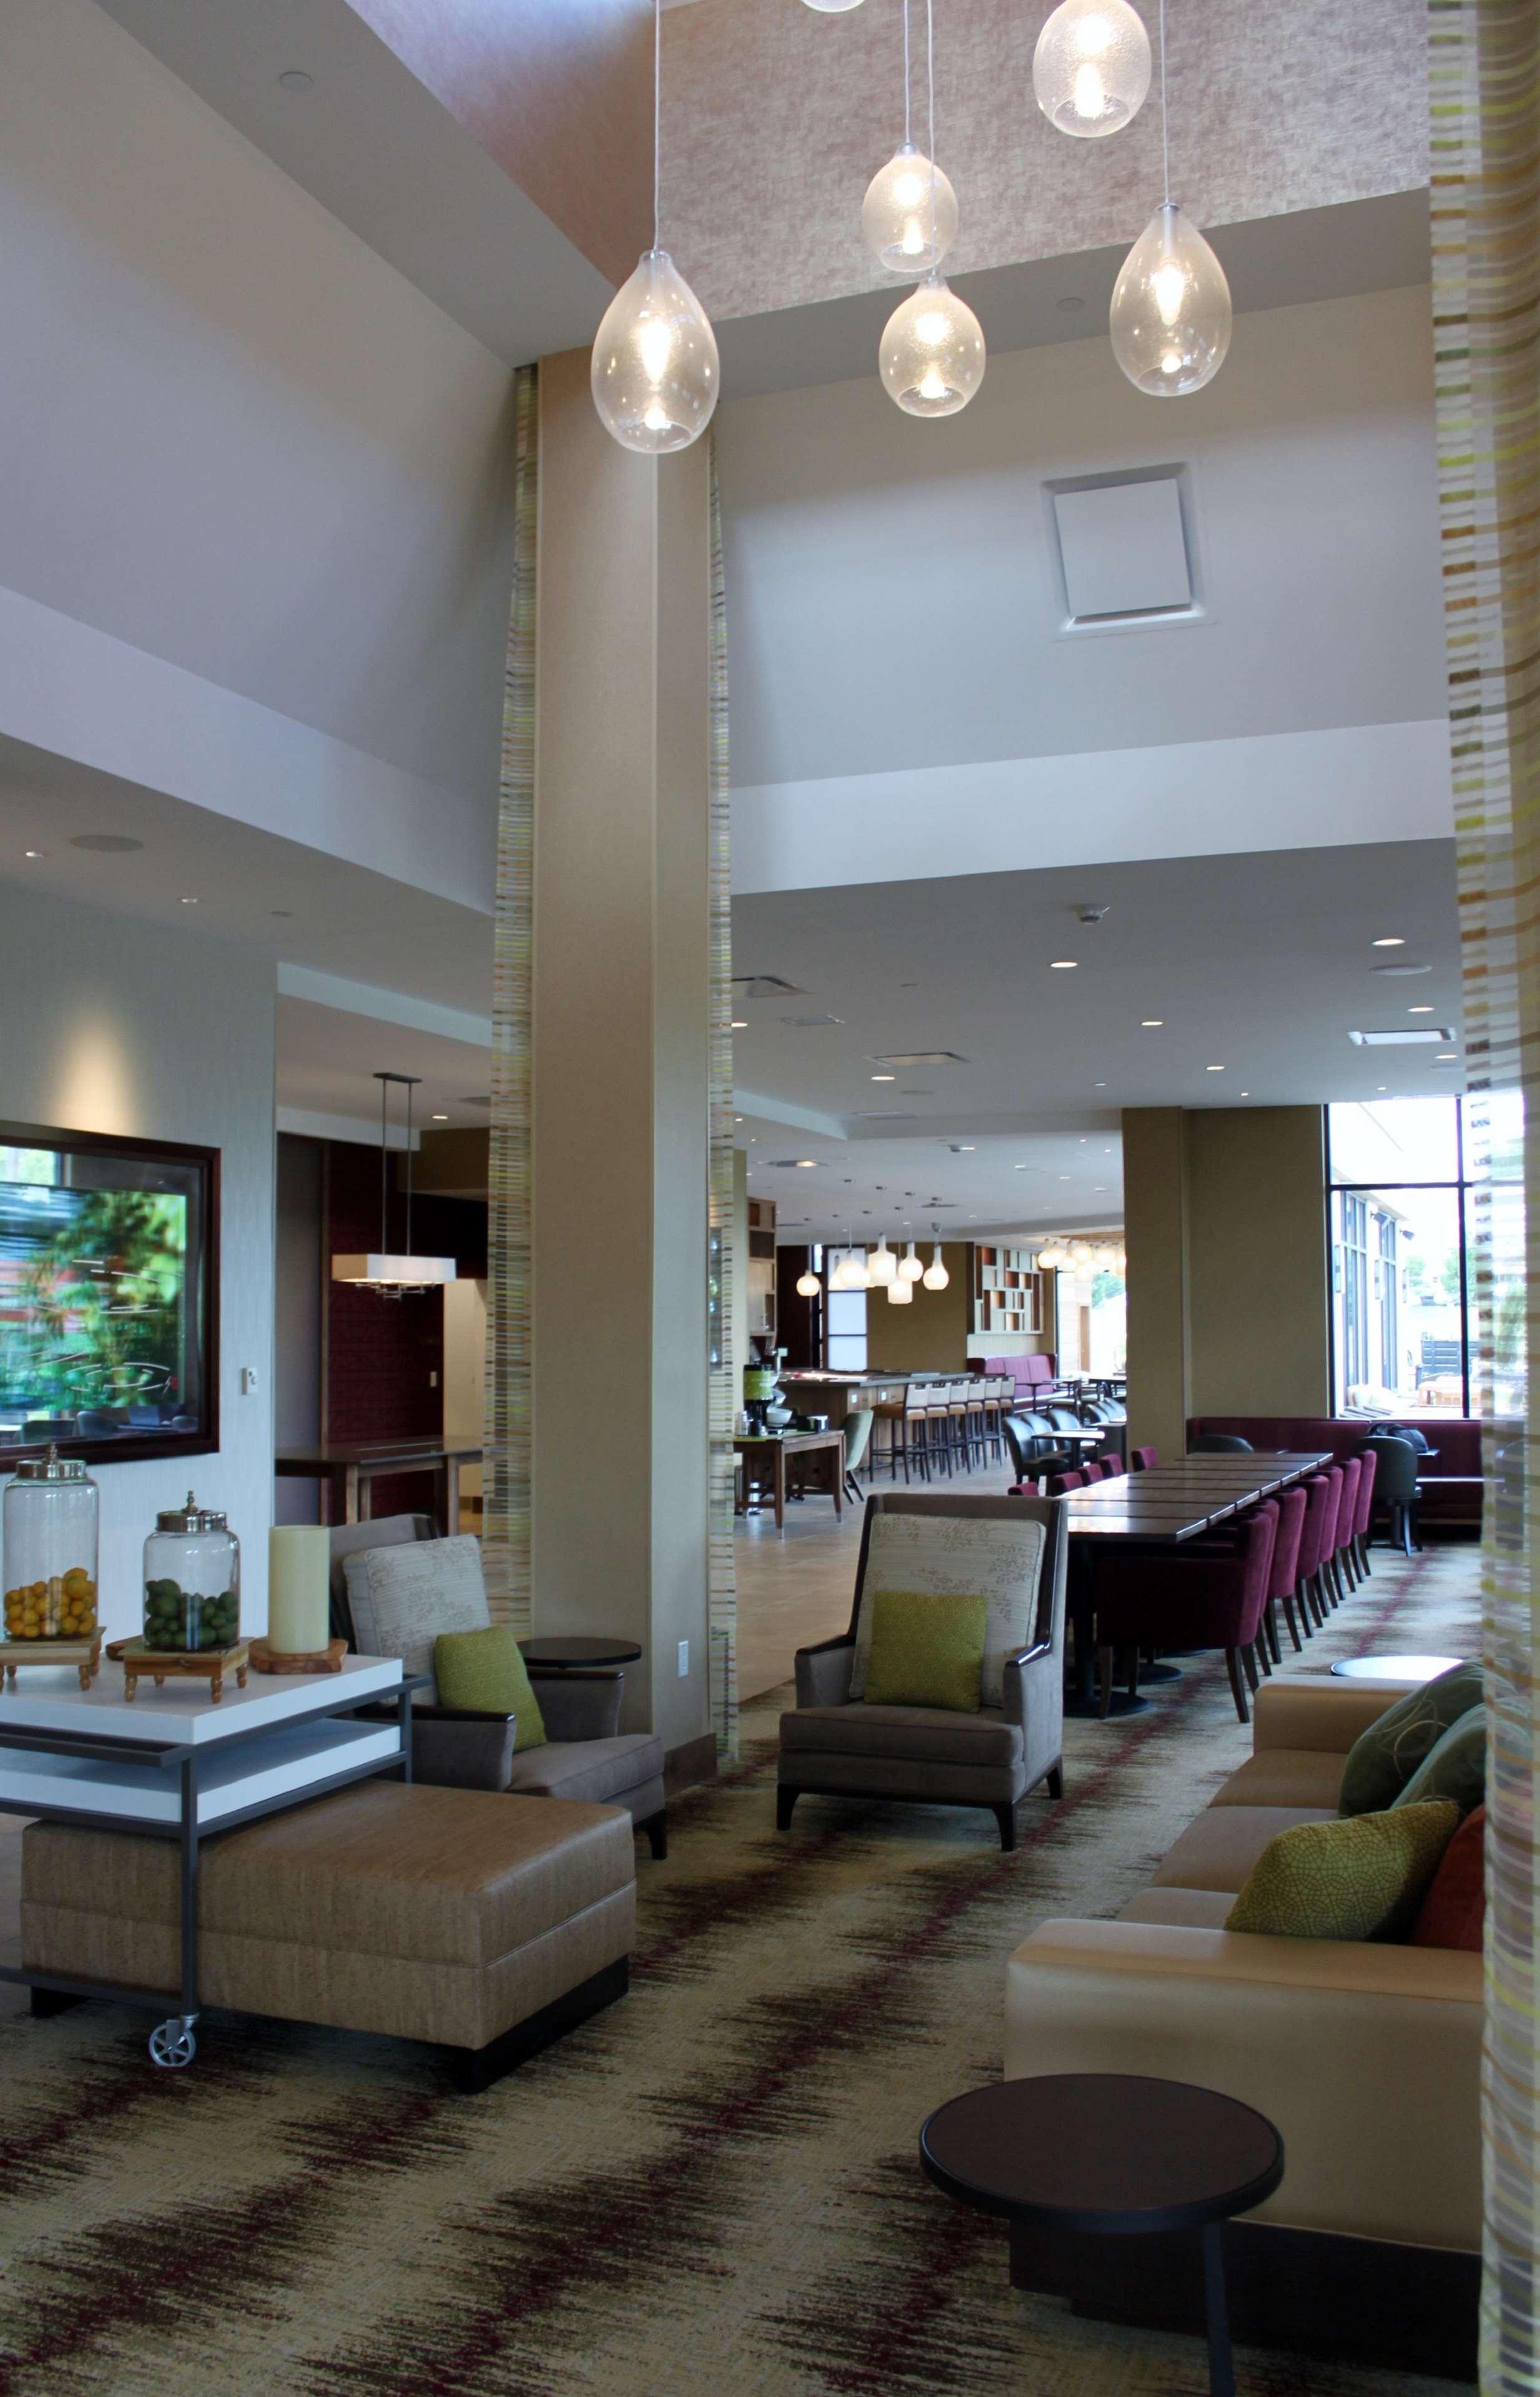 Hilton Garden Inn Boston/Marlborough image 30